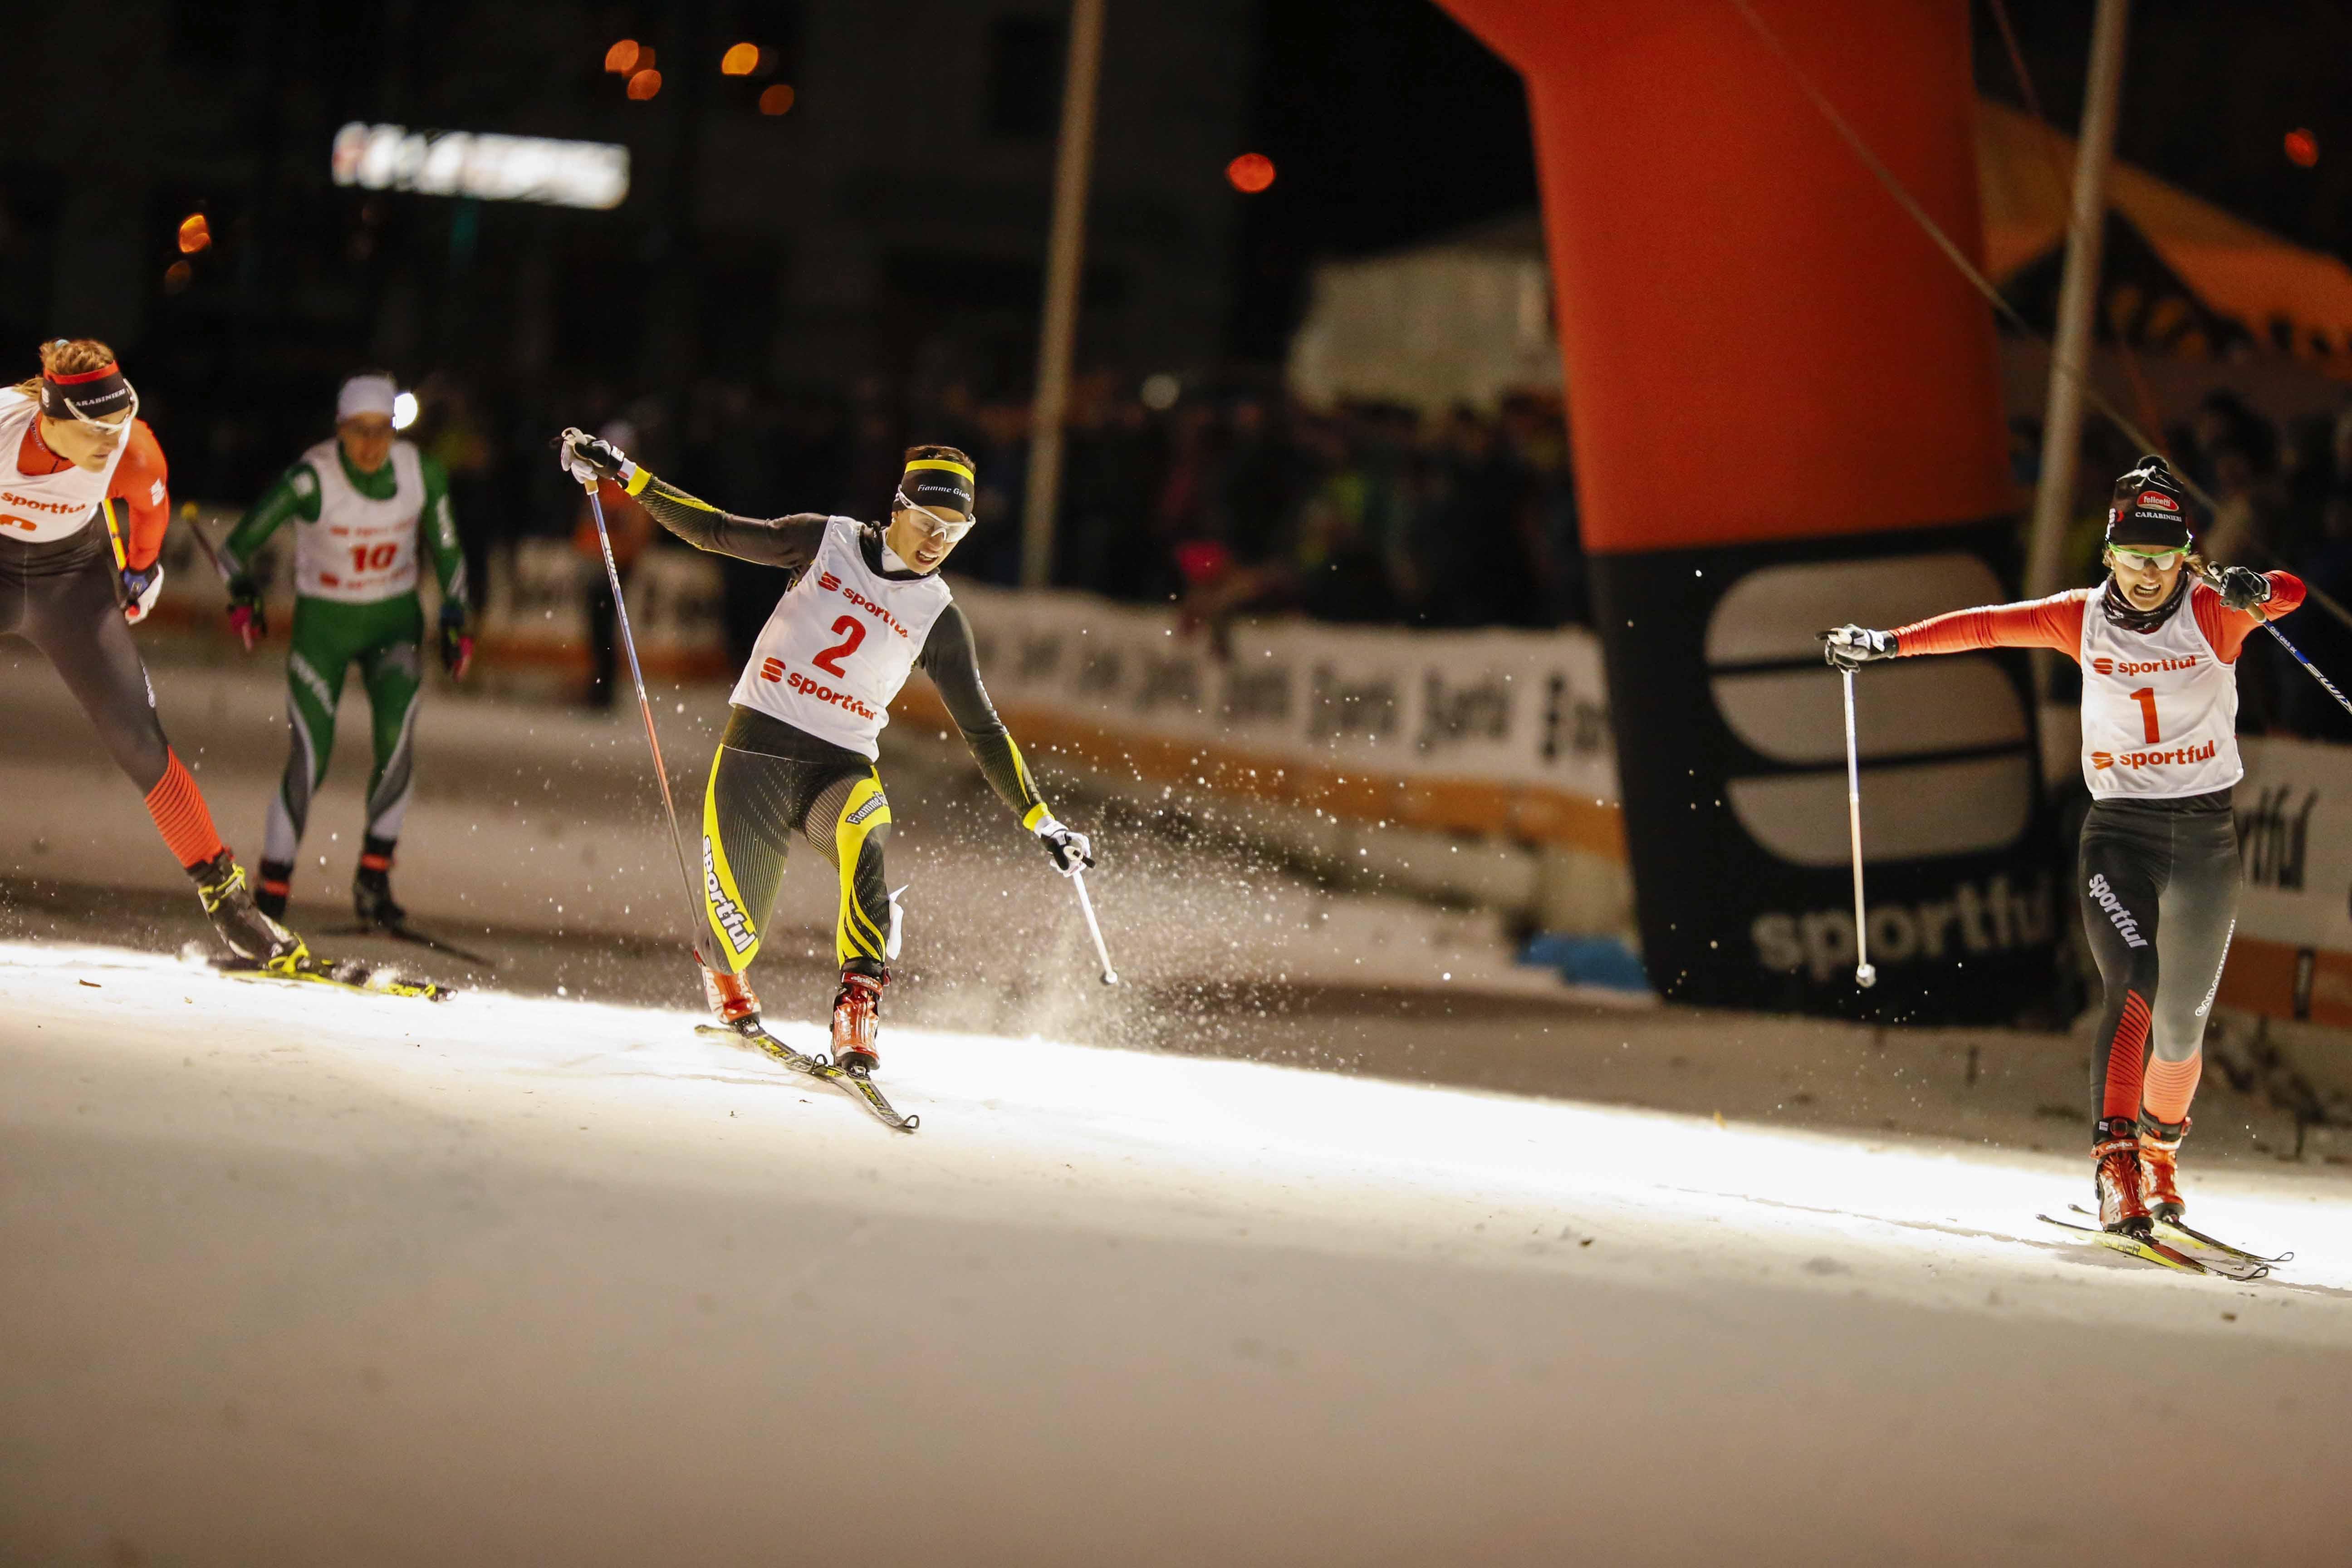 Mondiali Sci 2020 Calendario.Www Skirollisti Org